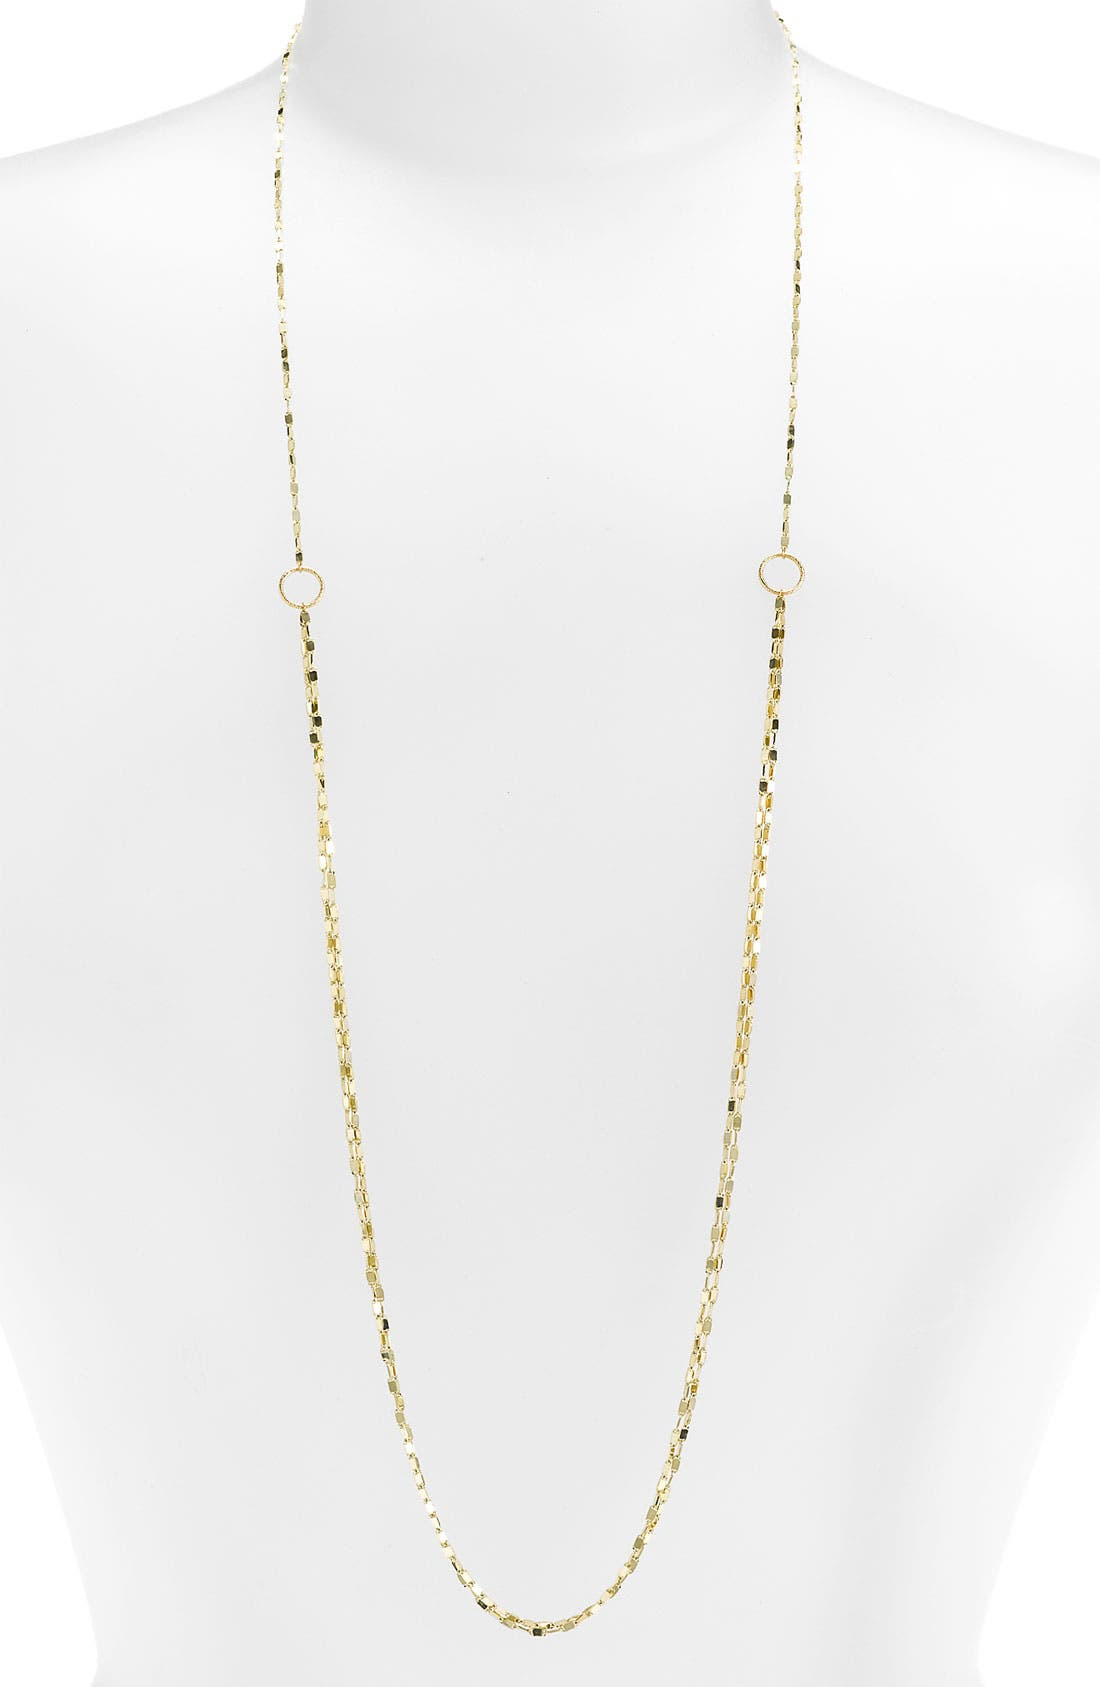 Alternate Image 1 Selected - Lana Jewelry 'Blake' Layering Necklace